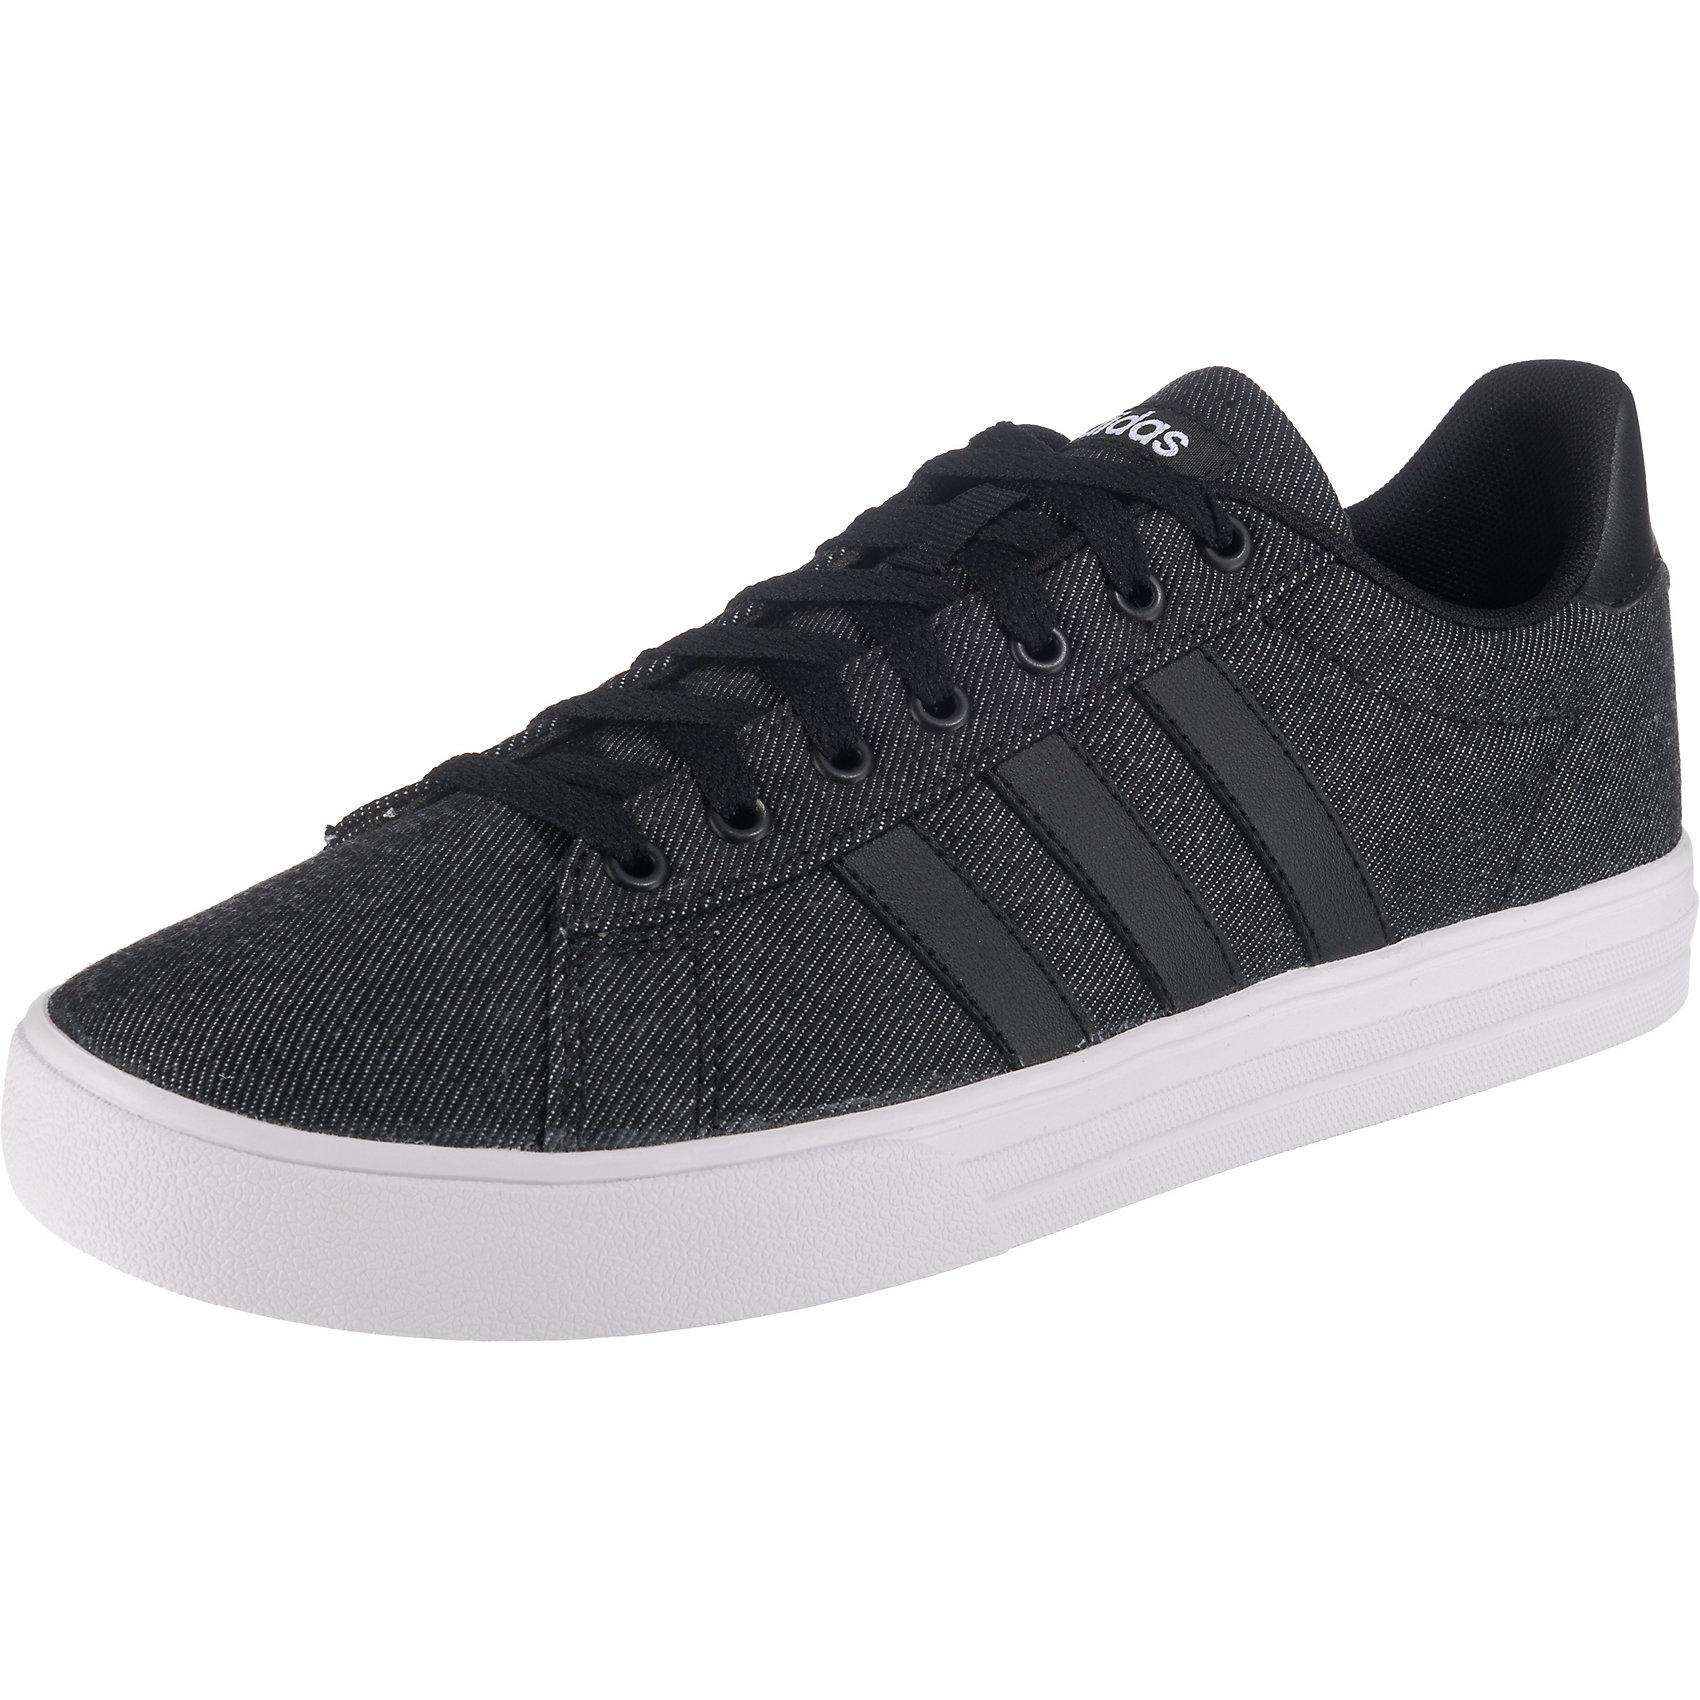 Neu adidas Sport InspiROT Daily für 2.0 2.0 2.0 Sneakers 7491074 für Daily ... 85b3e9